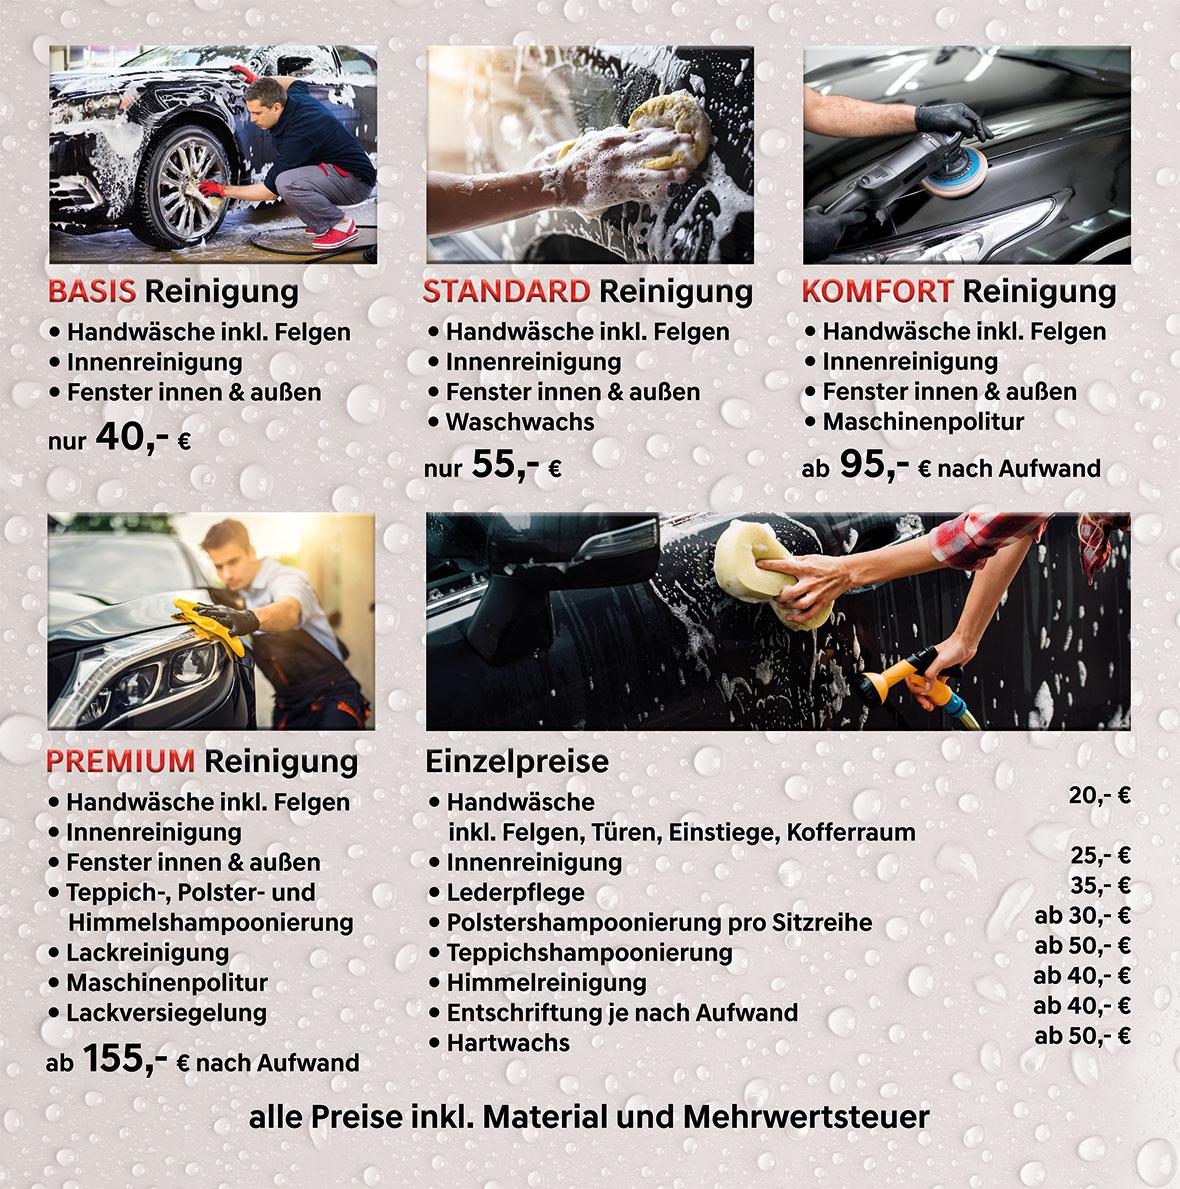 Kfz-Handwaesche